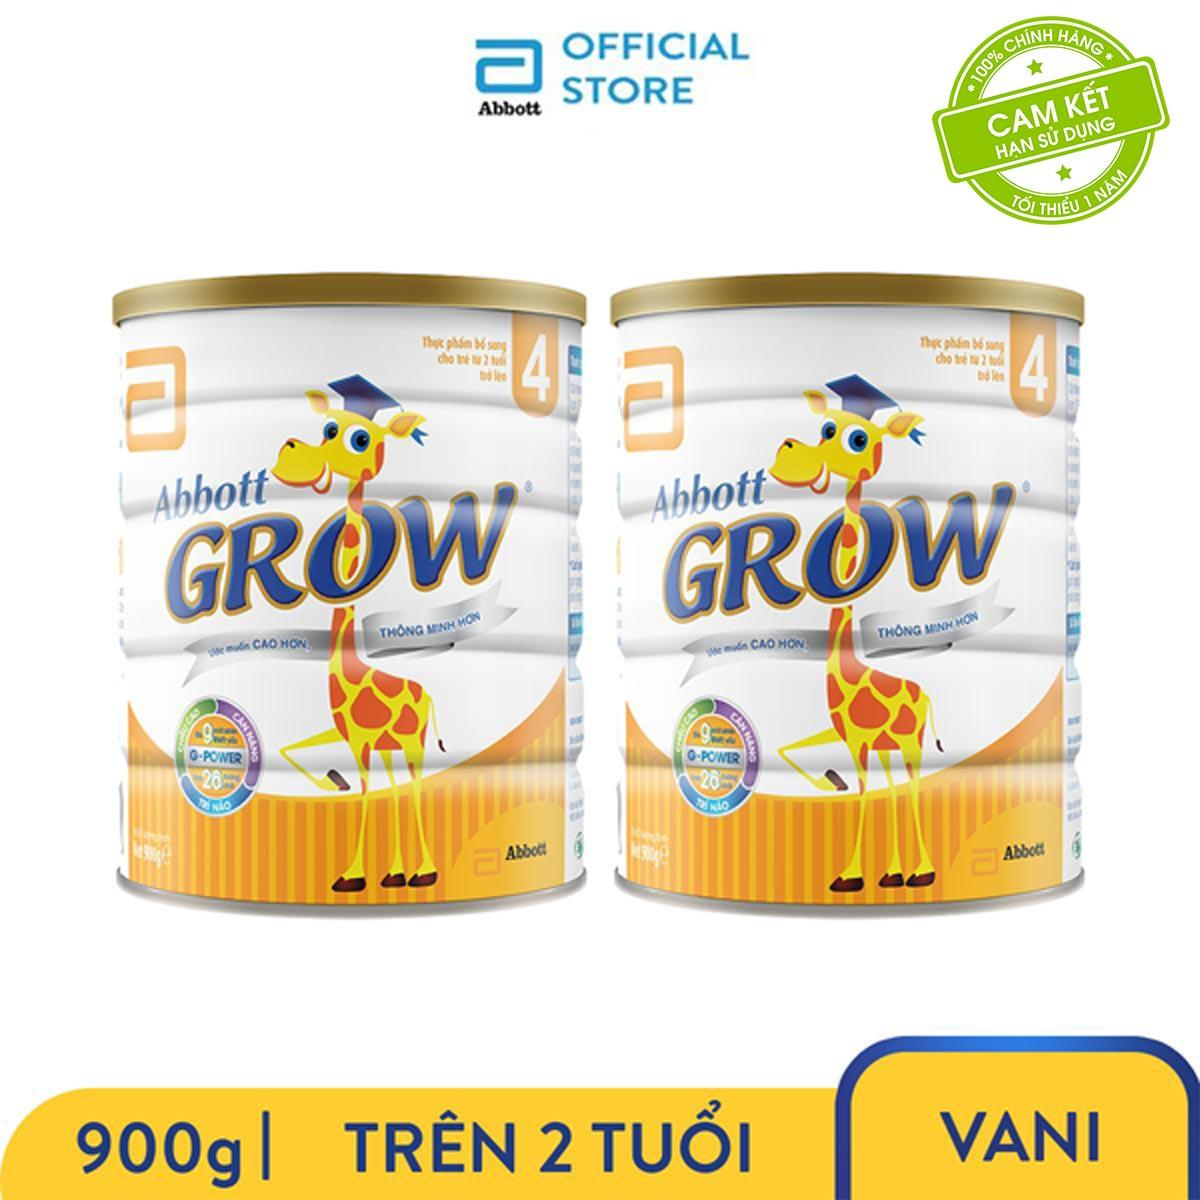 Voucher Khuyến Mại Bộ 2 Sữa Bột Abbott Grow 4 (G-Power) Hương Vani 900g